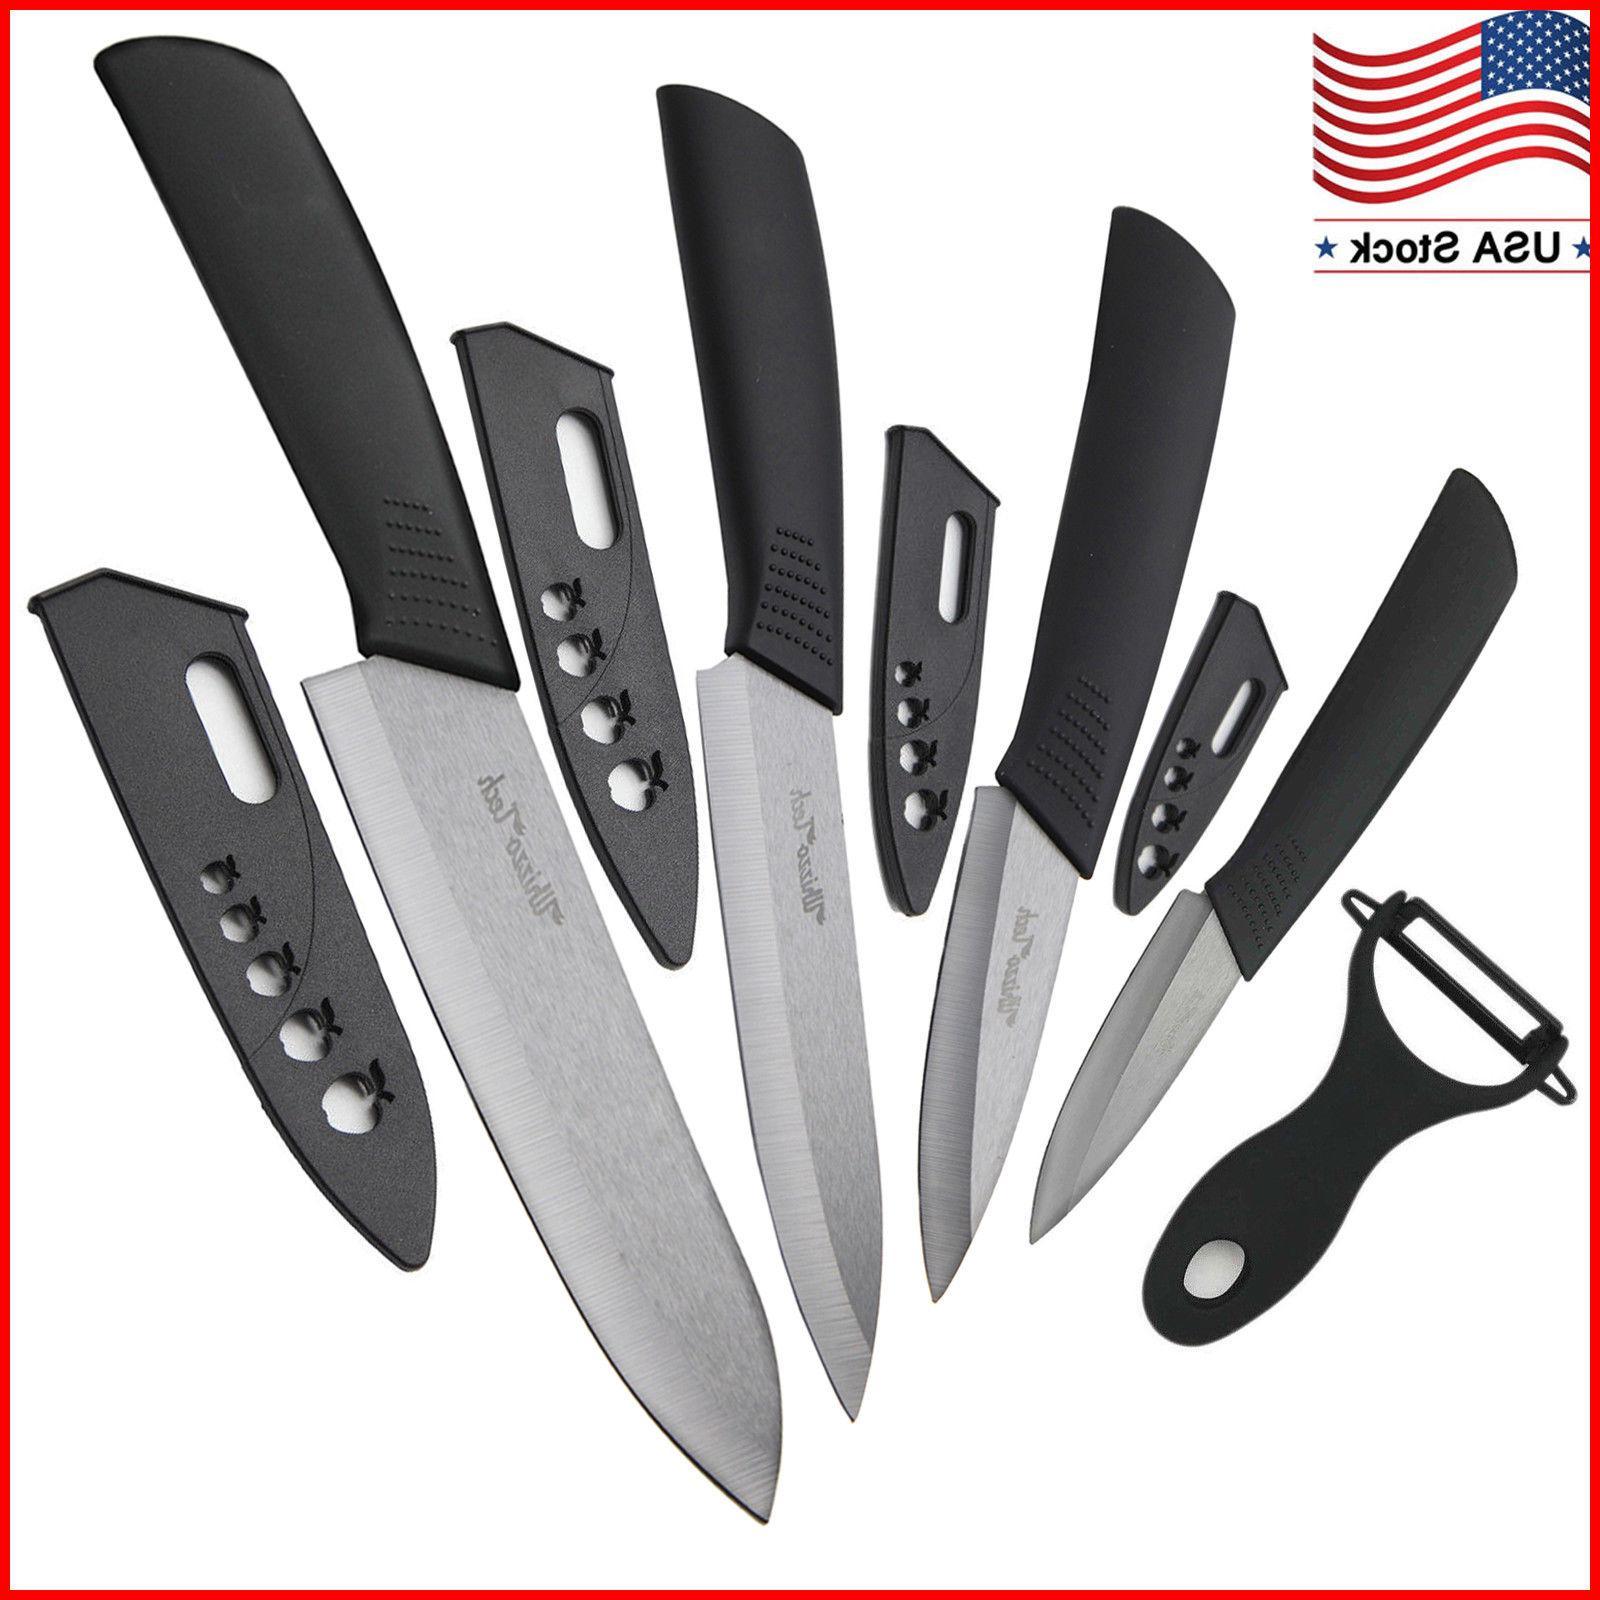 "Blade Sharp Ceramic knife Set Kitchen Knives 3"" 4"" 5"" 6"" + P"